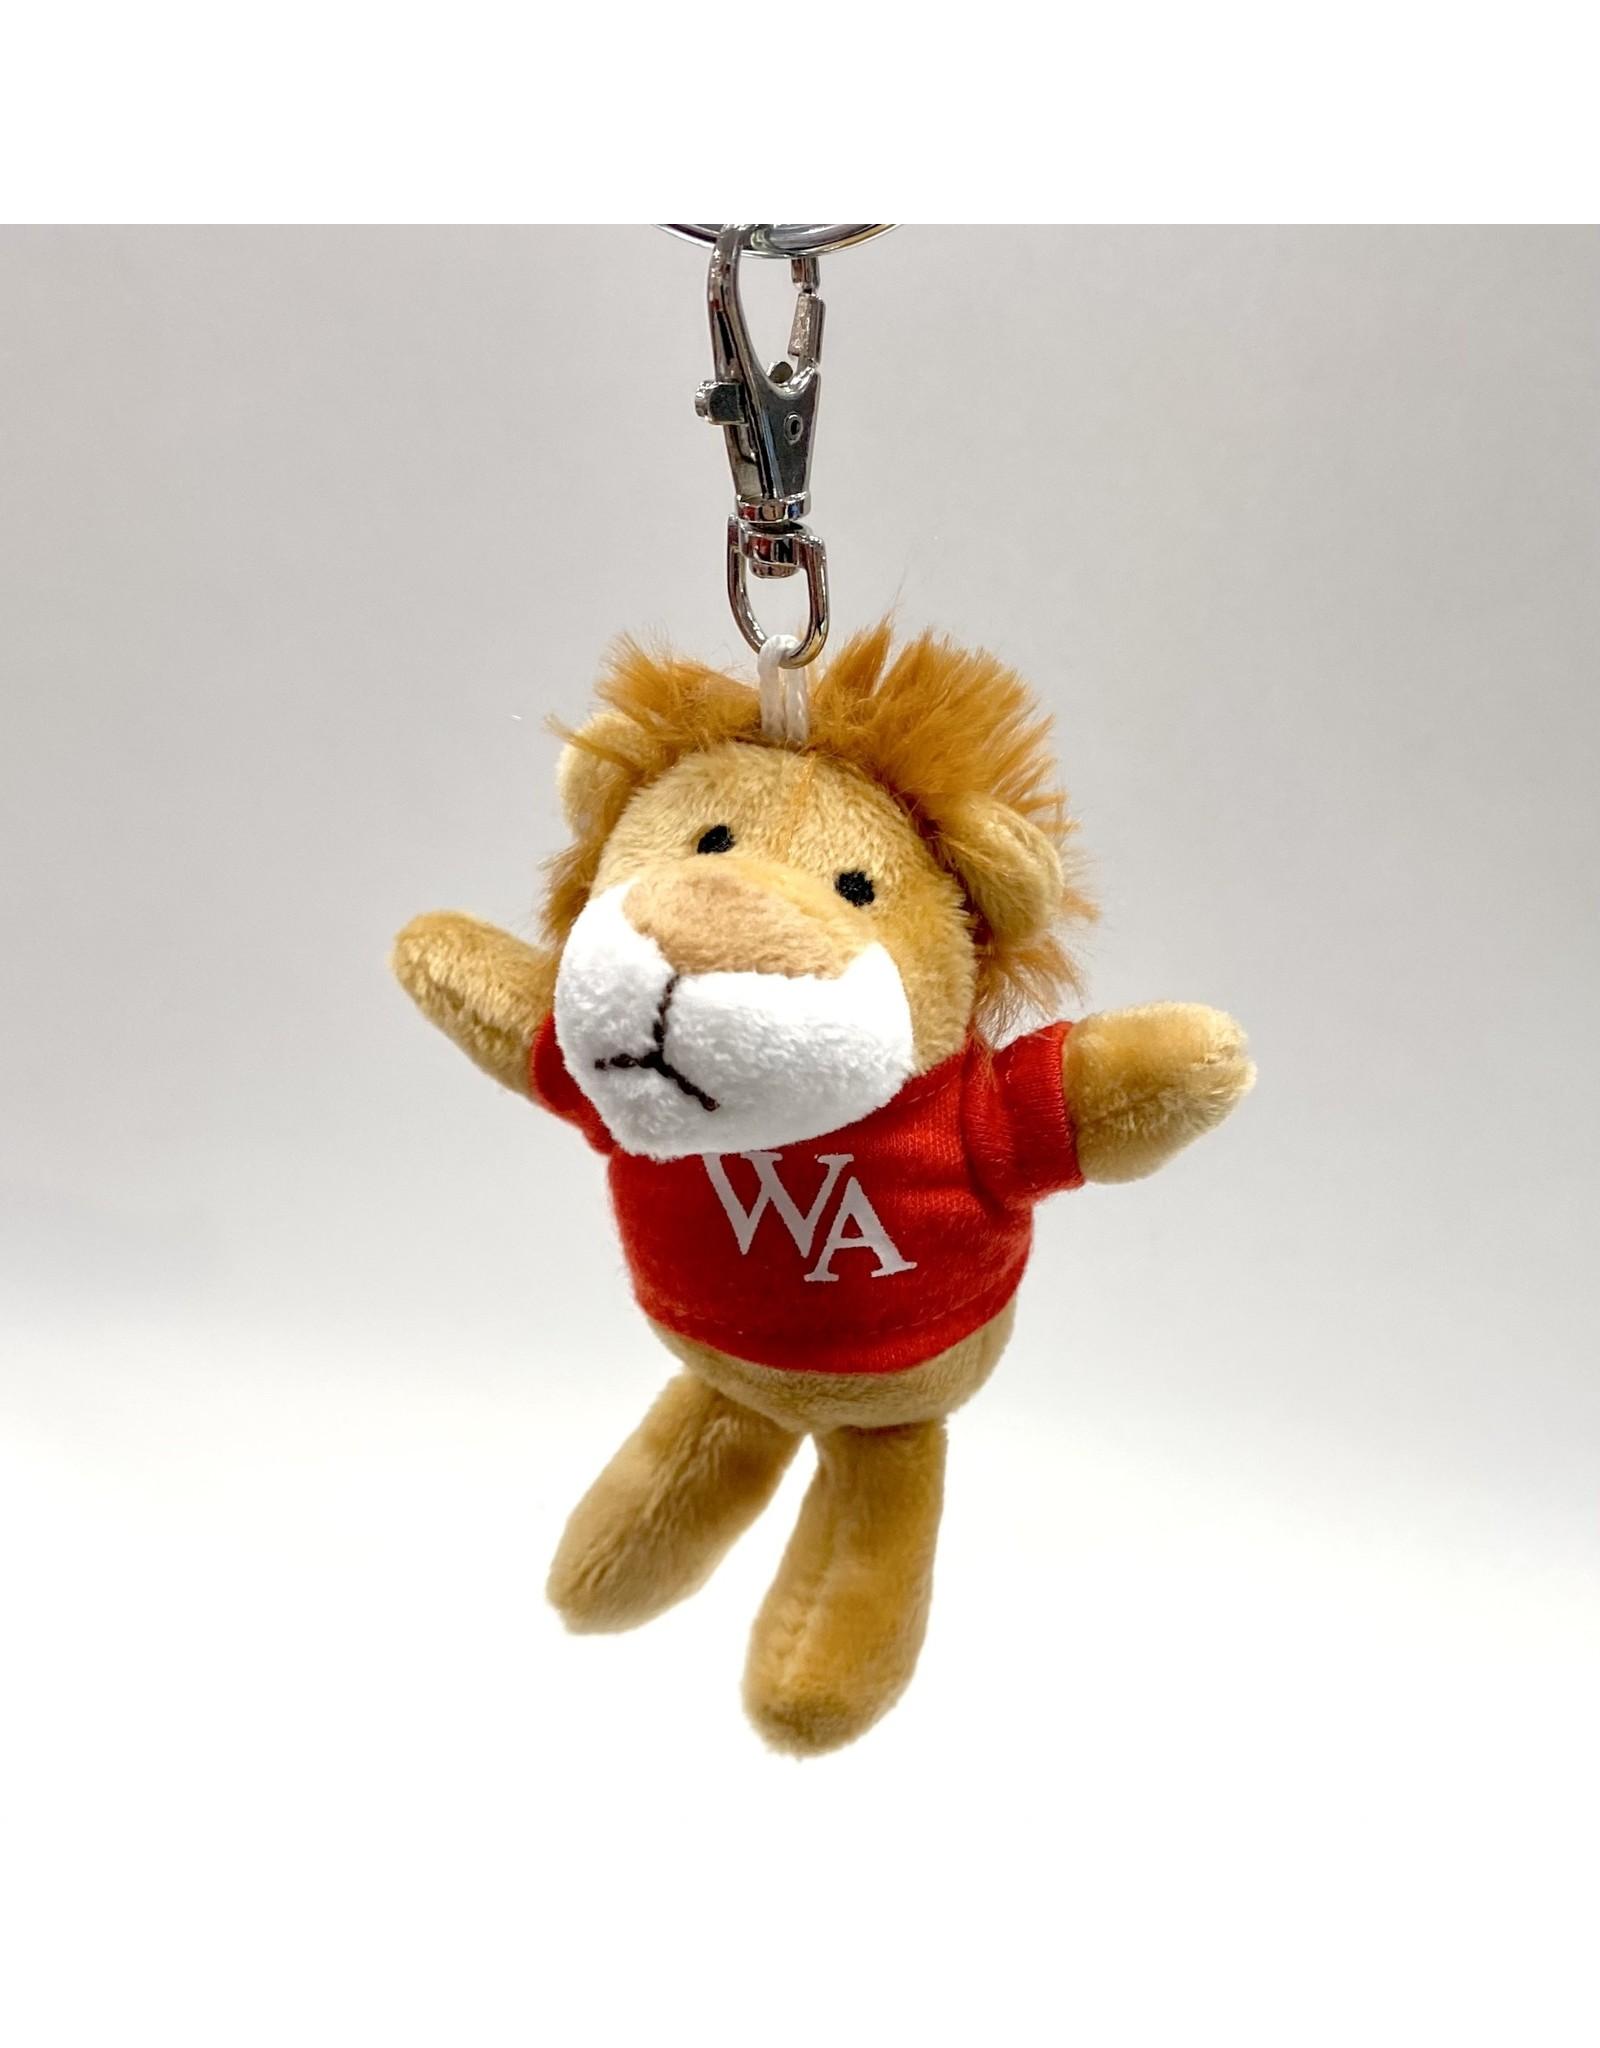 Mascot Factory PLUSH KEYCHAIN LION